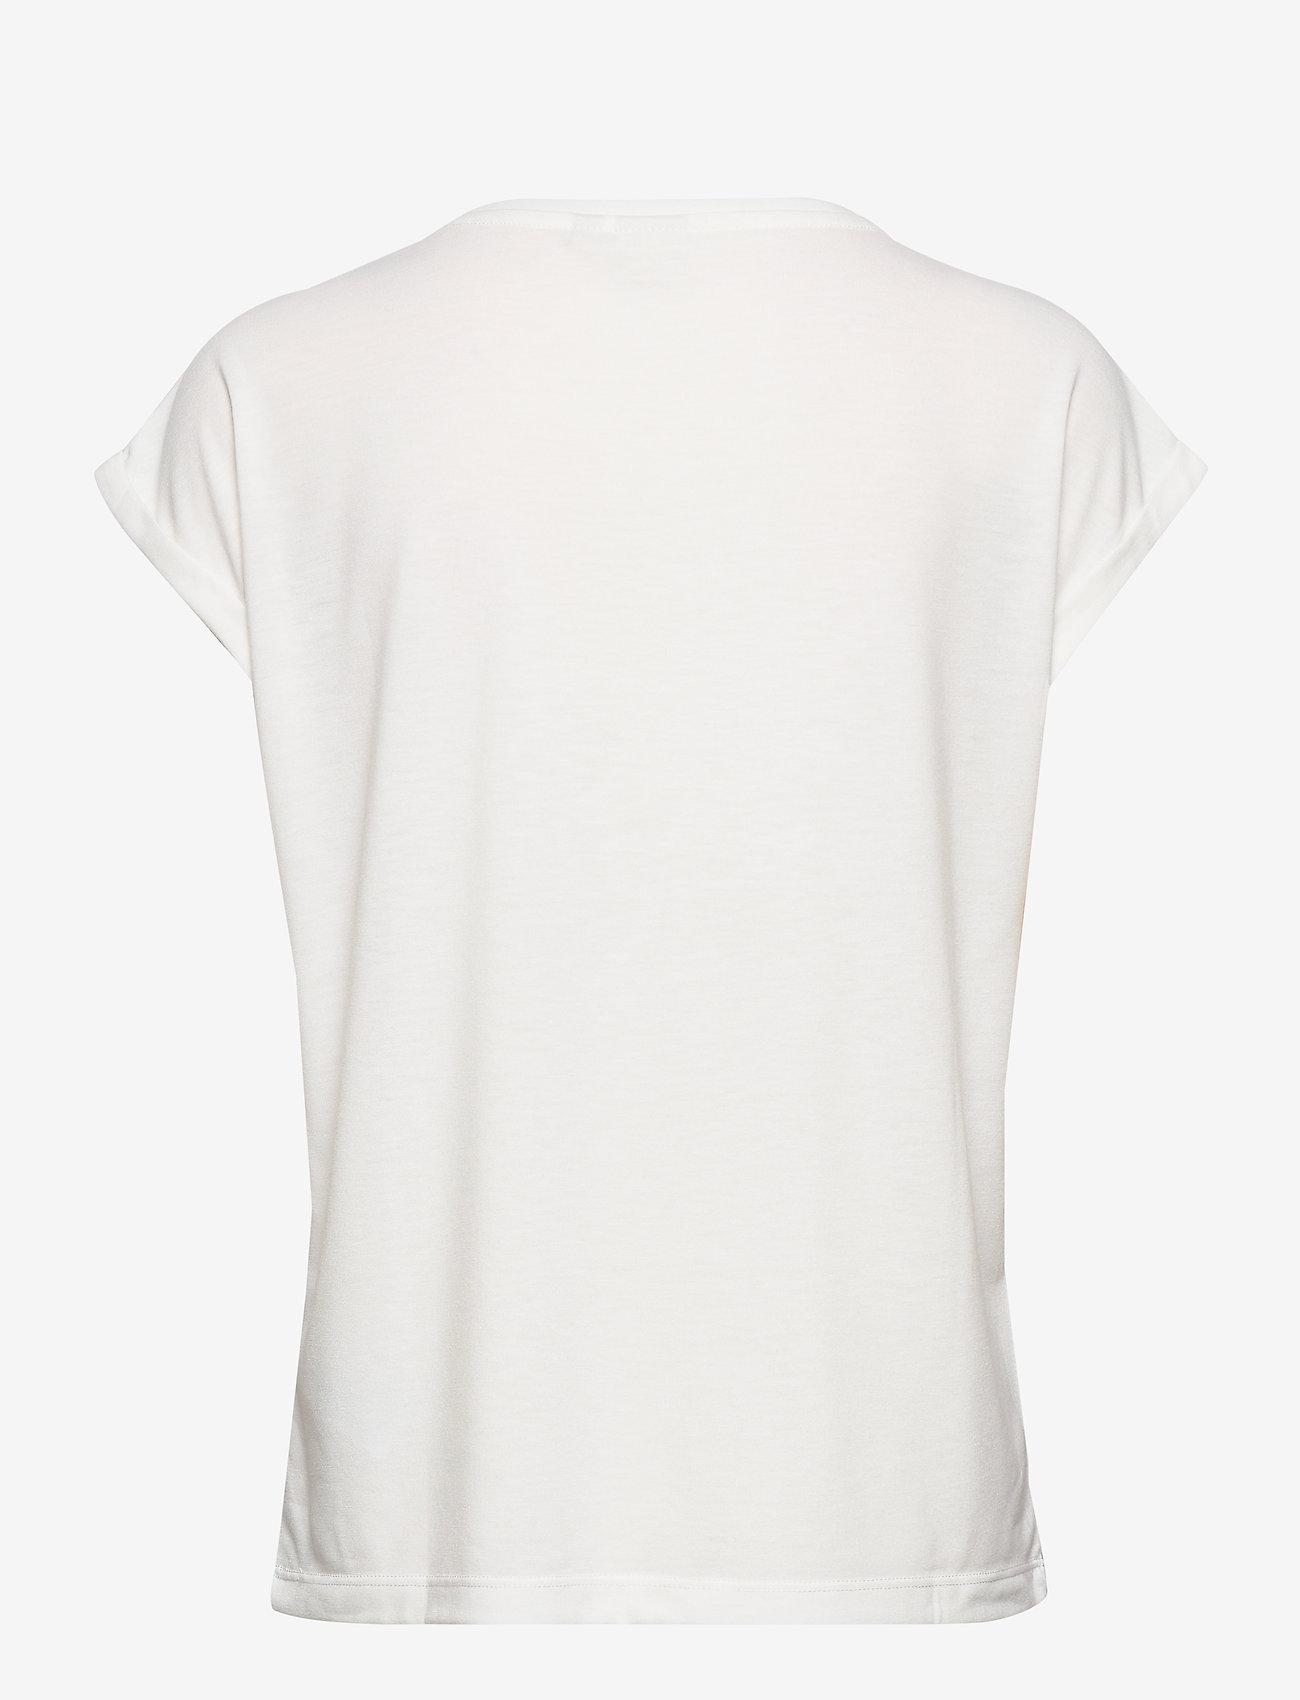 Natiancr T-shirt (Soft Green) - Cream bCCGCa